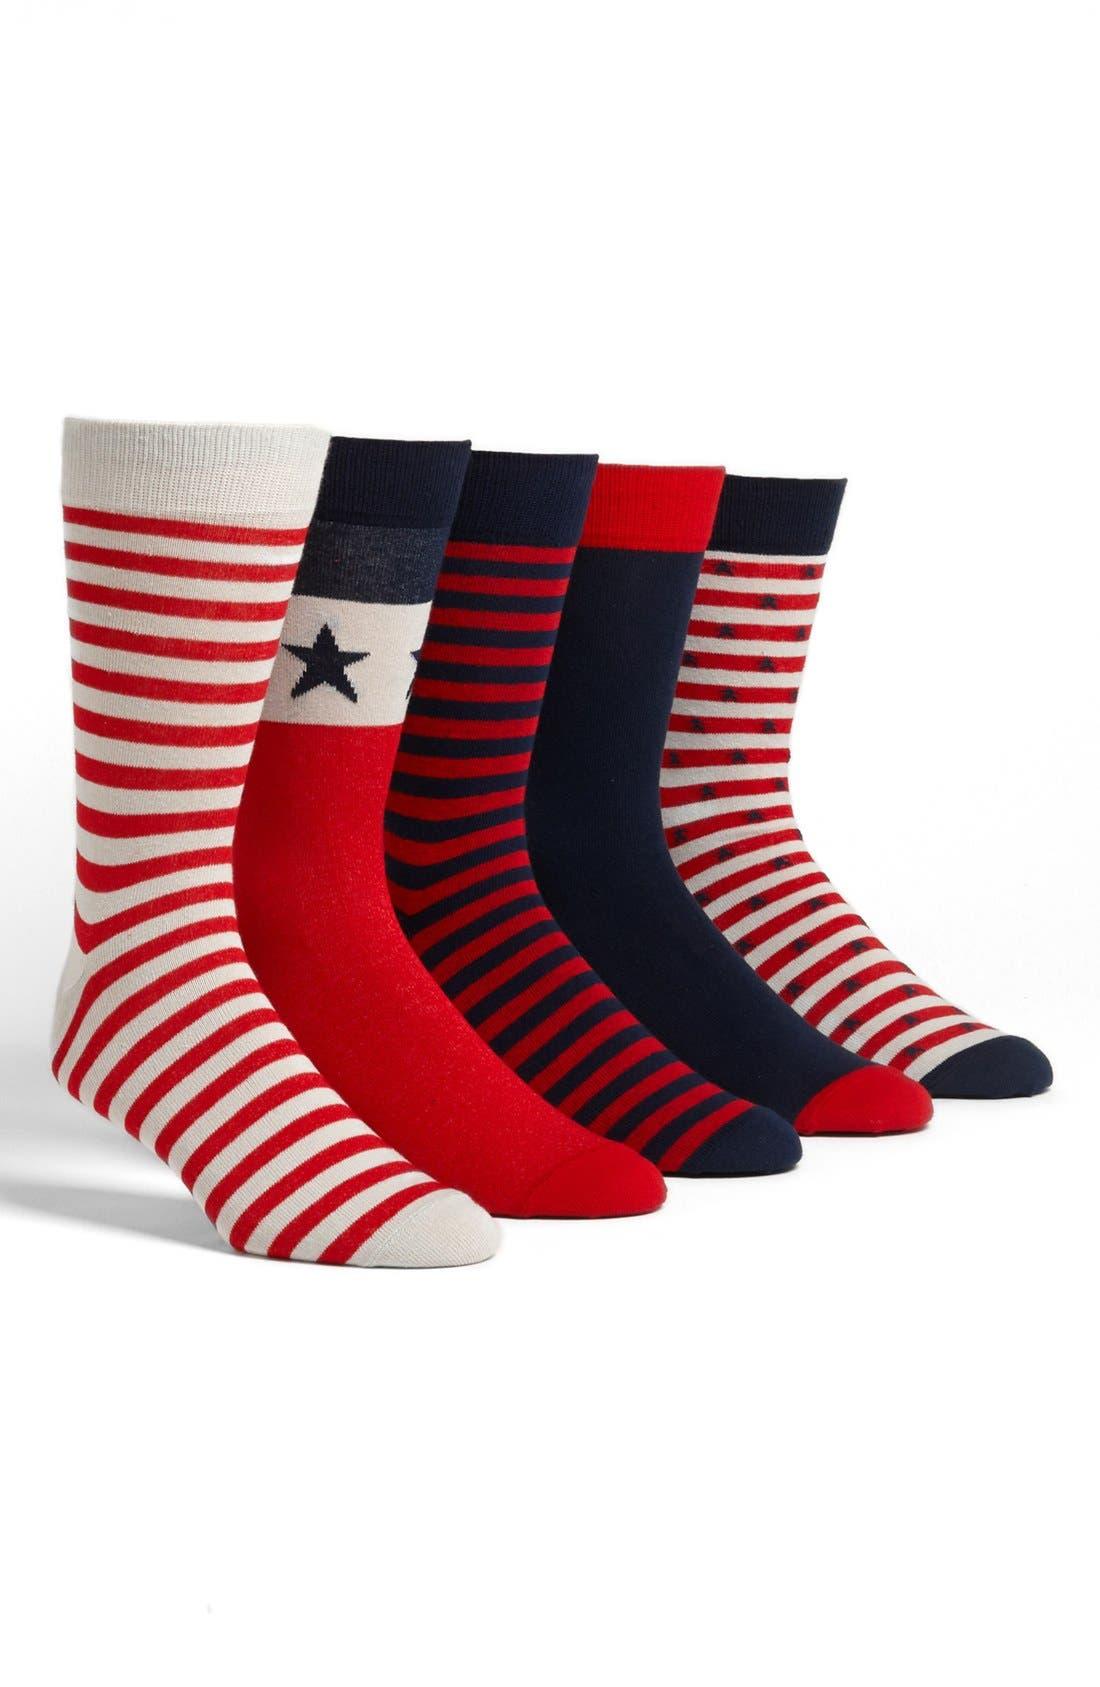 Alternate Image 1 Selected - Topman Americana Pattern Socks (Set of 5)